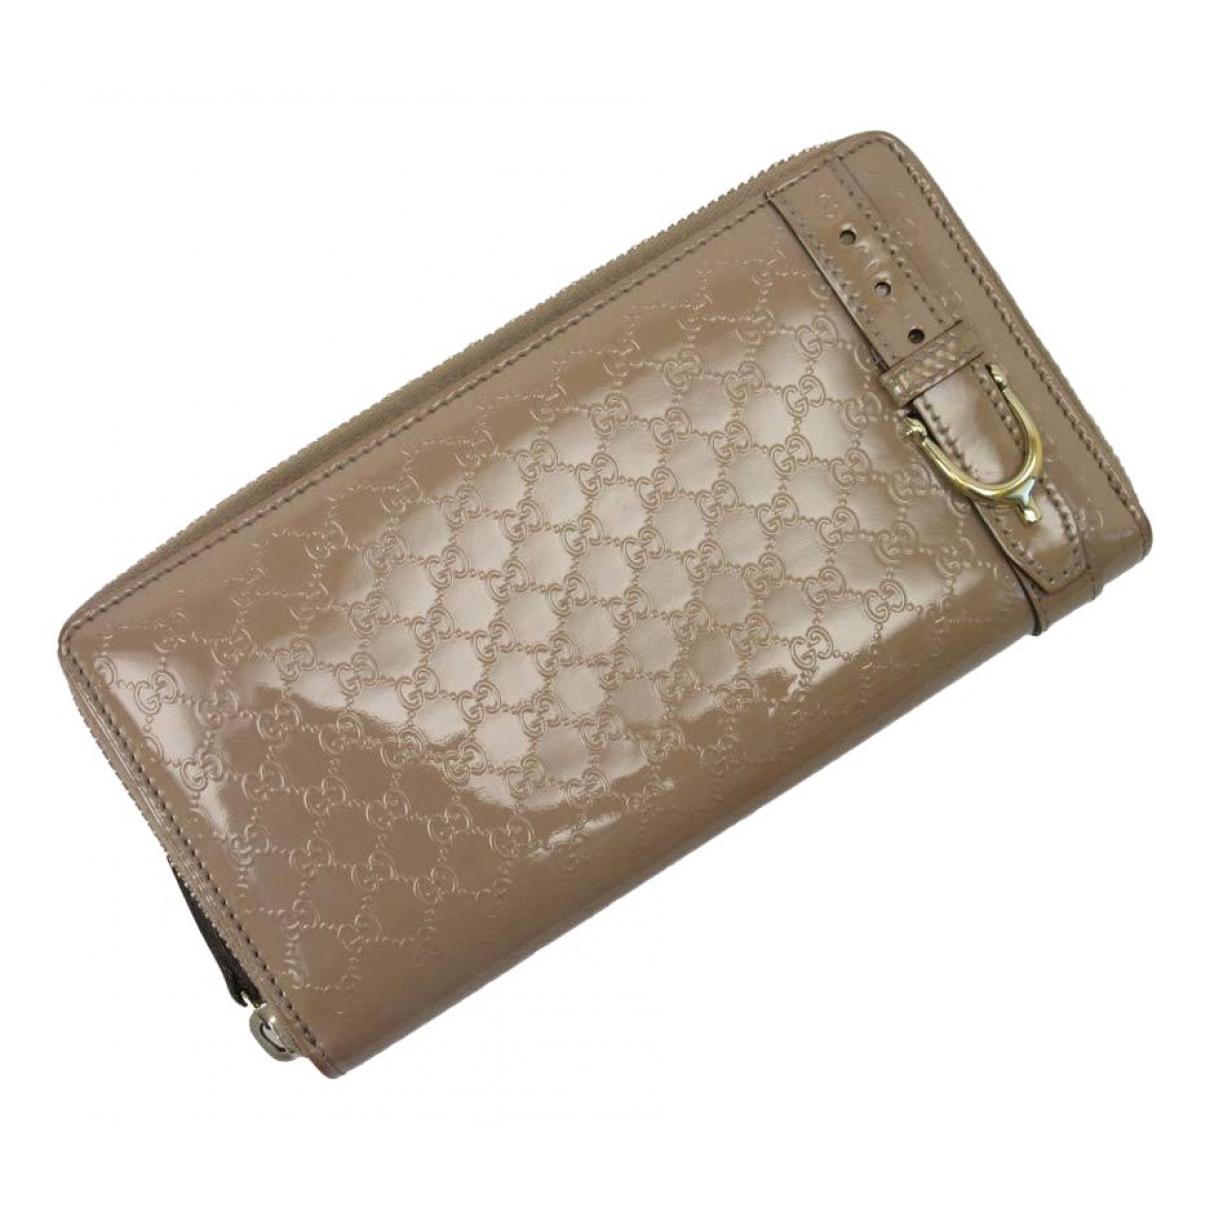 Gucci \N Portemonnaie in  Beige Lackleder